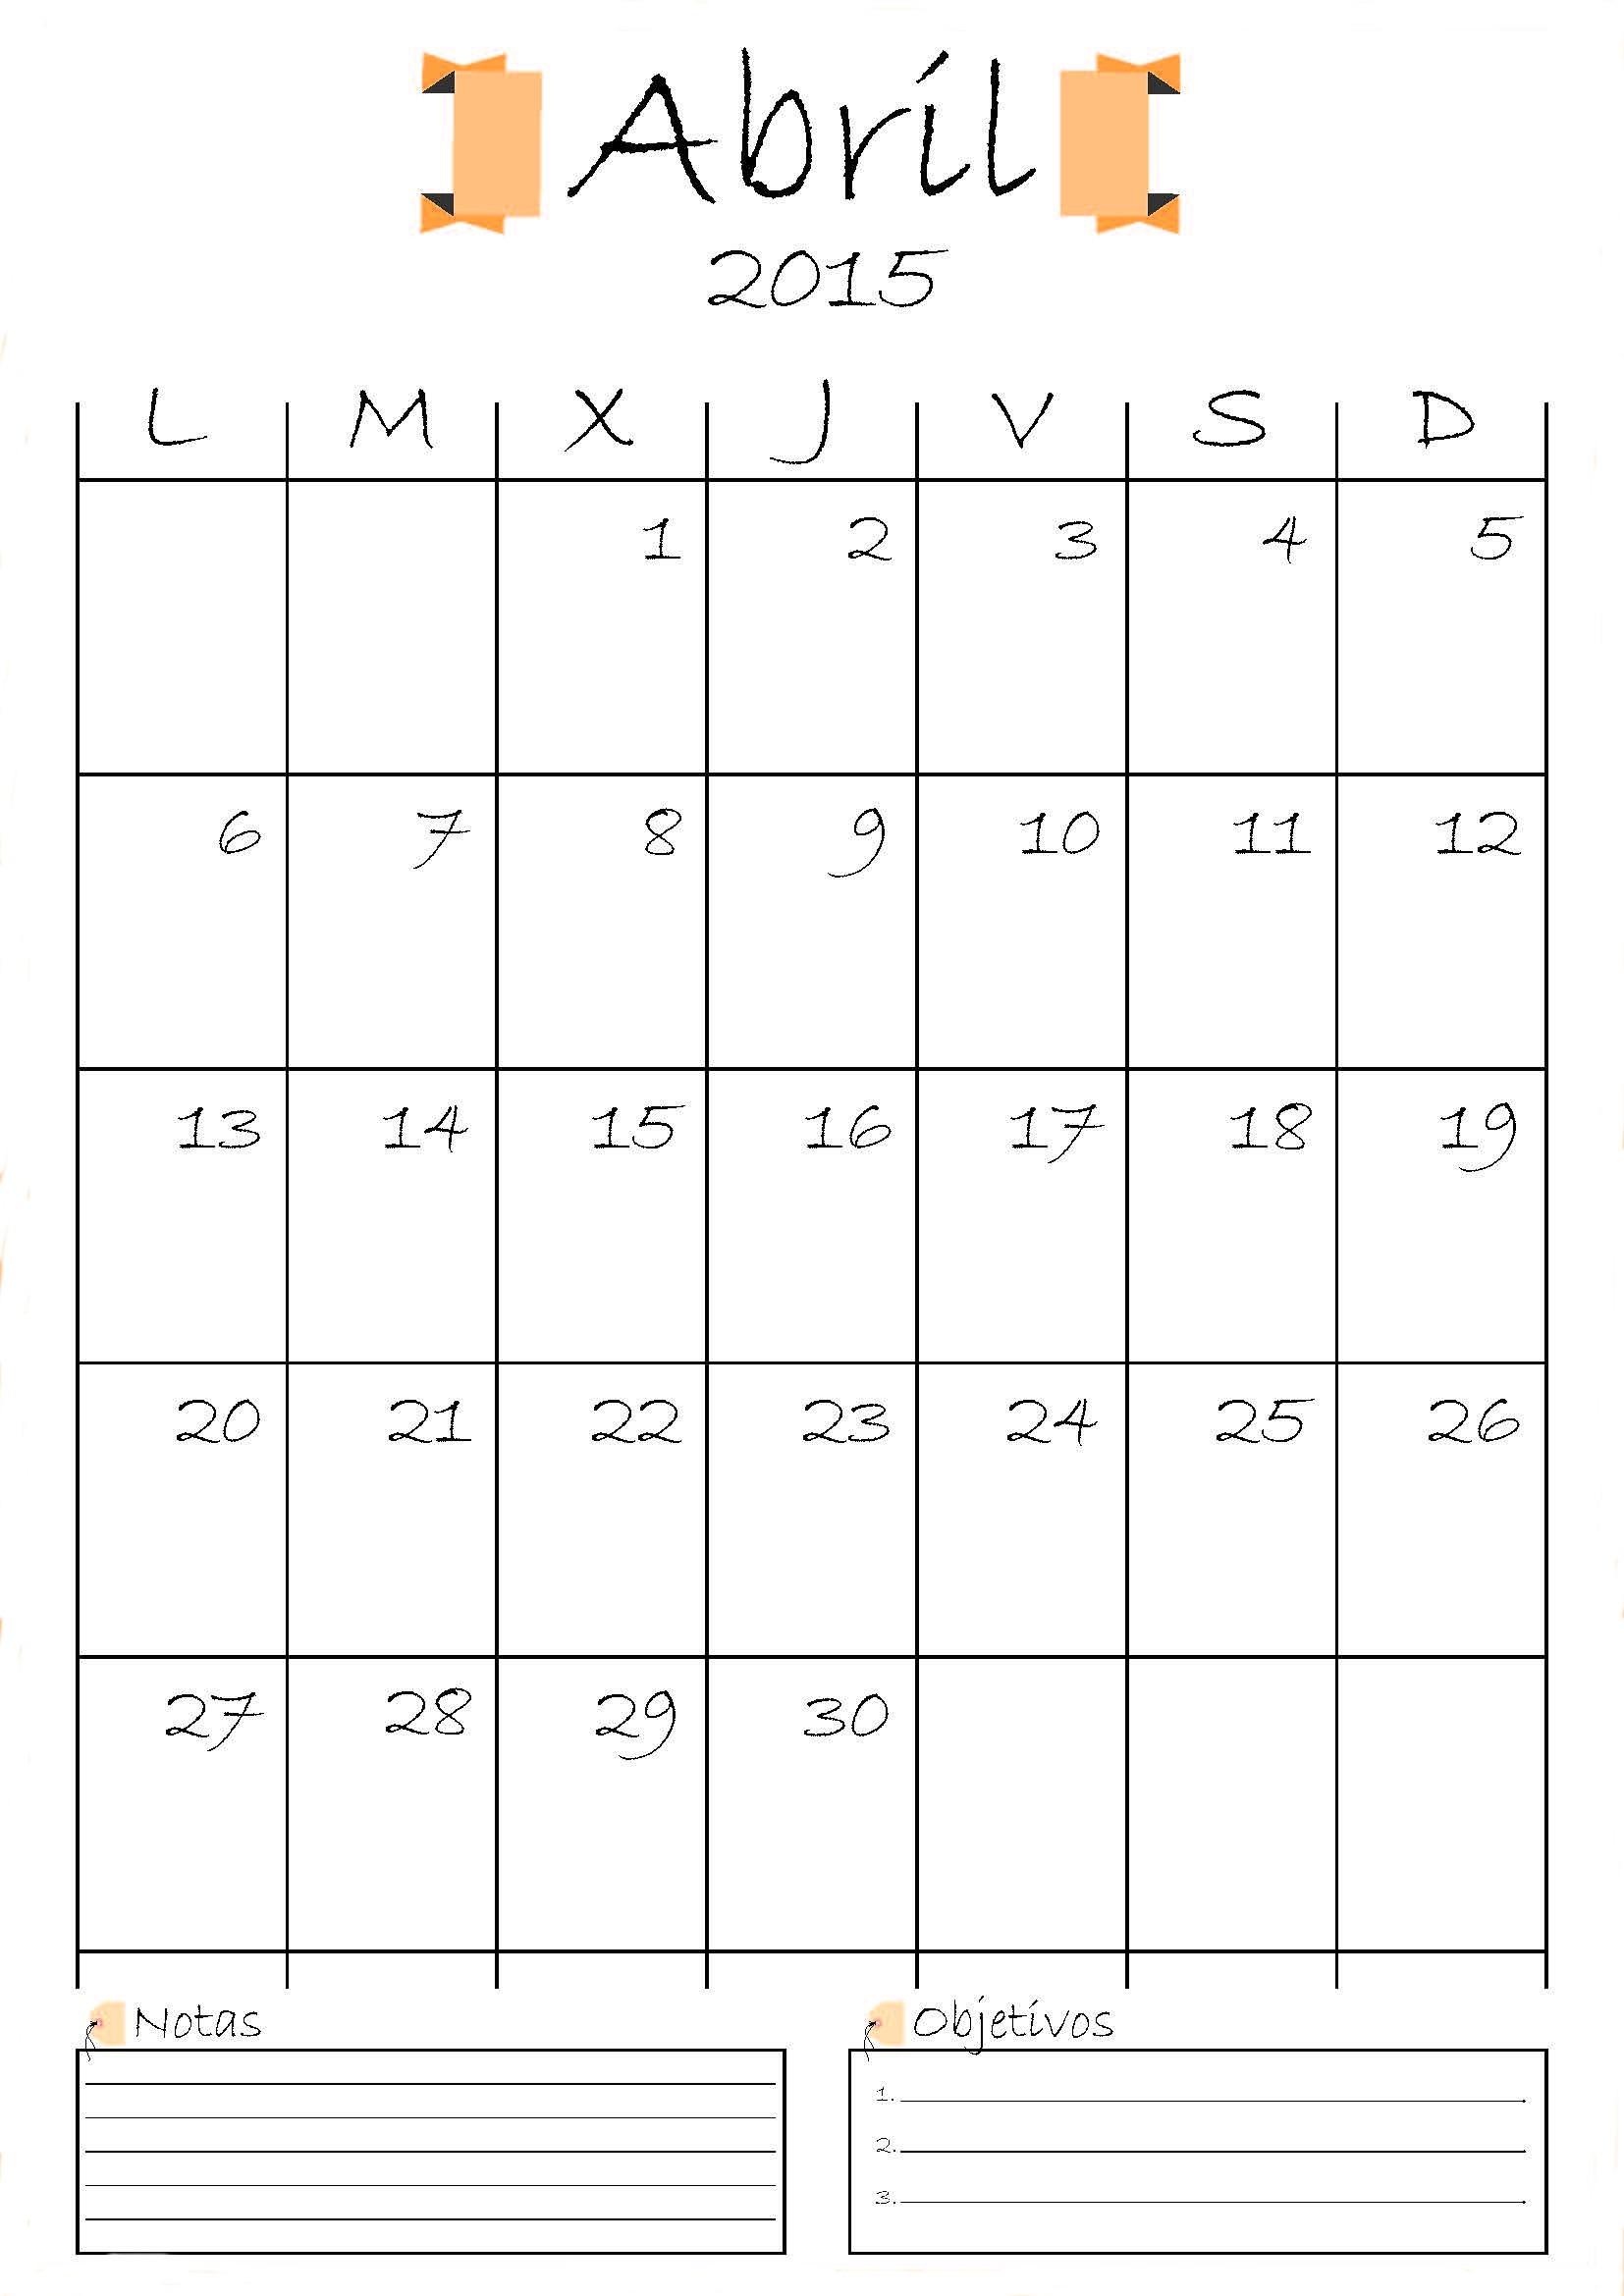 calendario en blanco 2015 Tomburorddiner